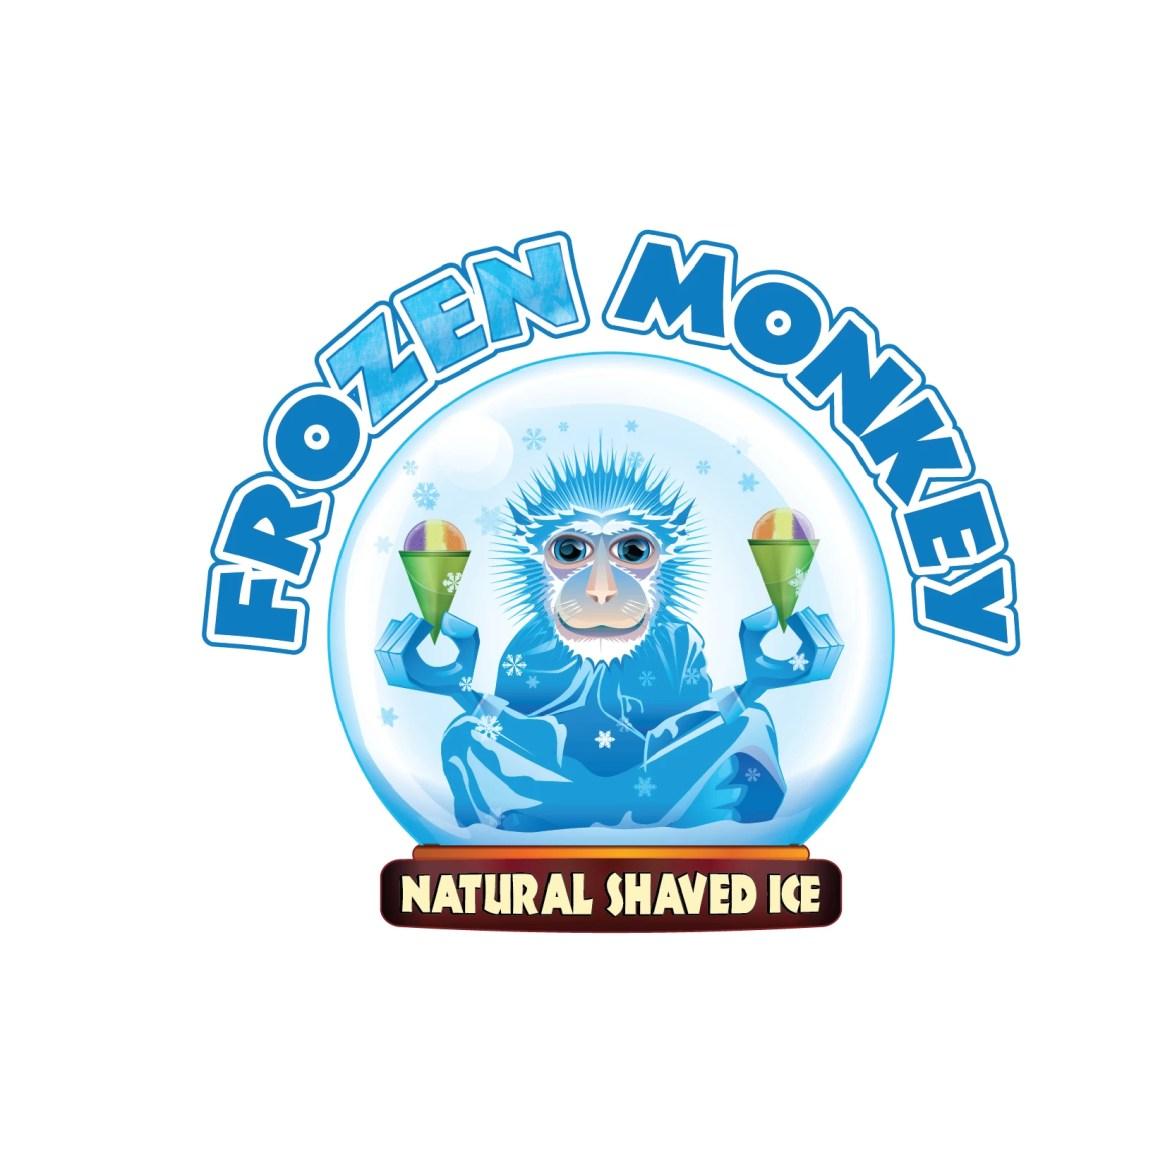 Frozen Monkey Natural Shaved Ice Logo